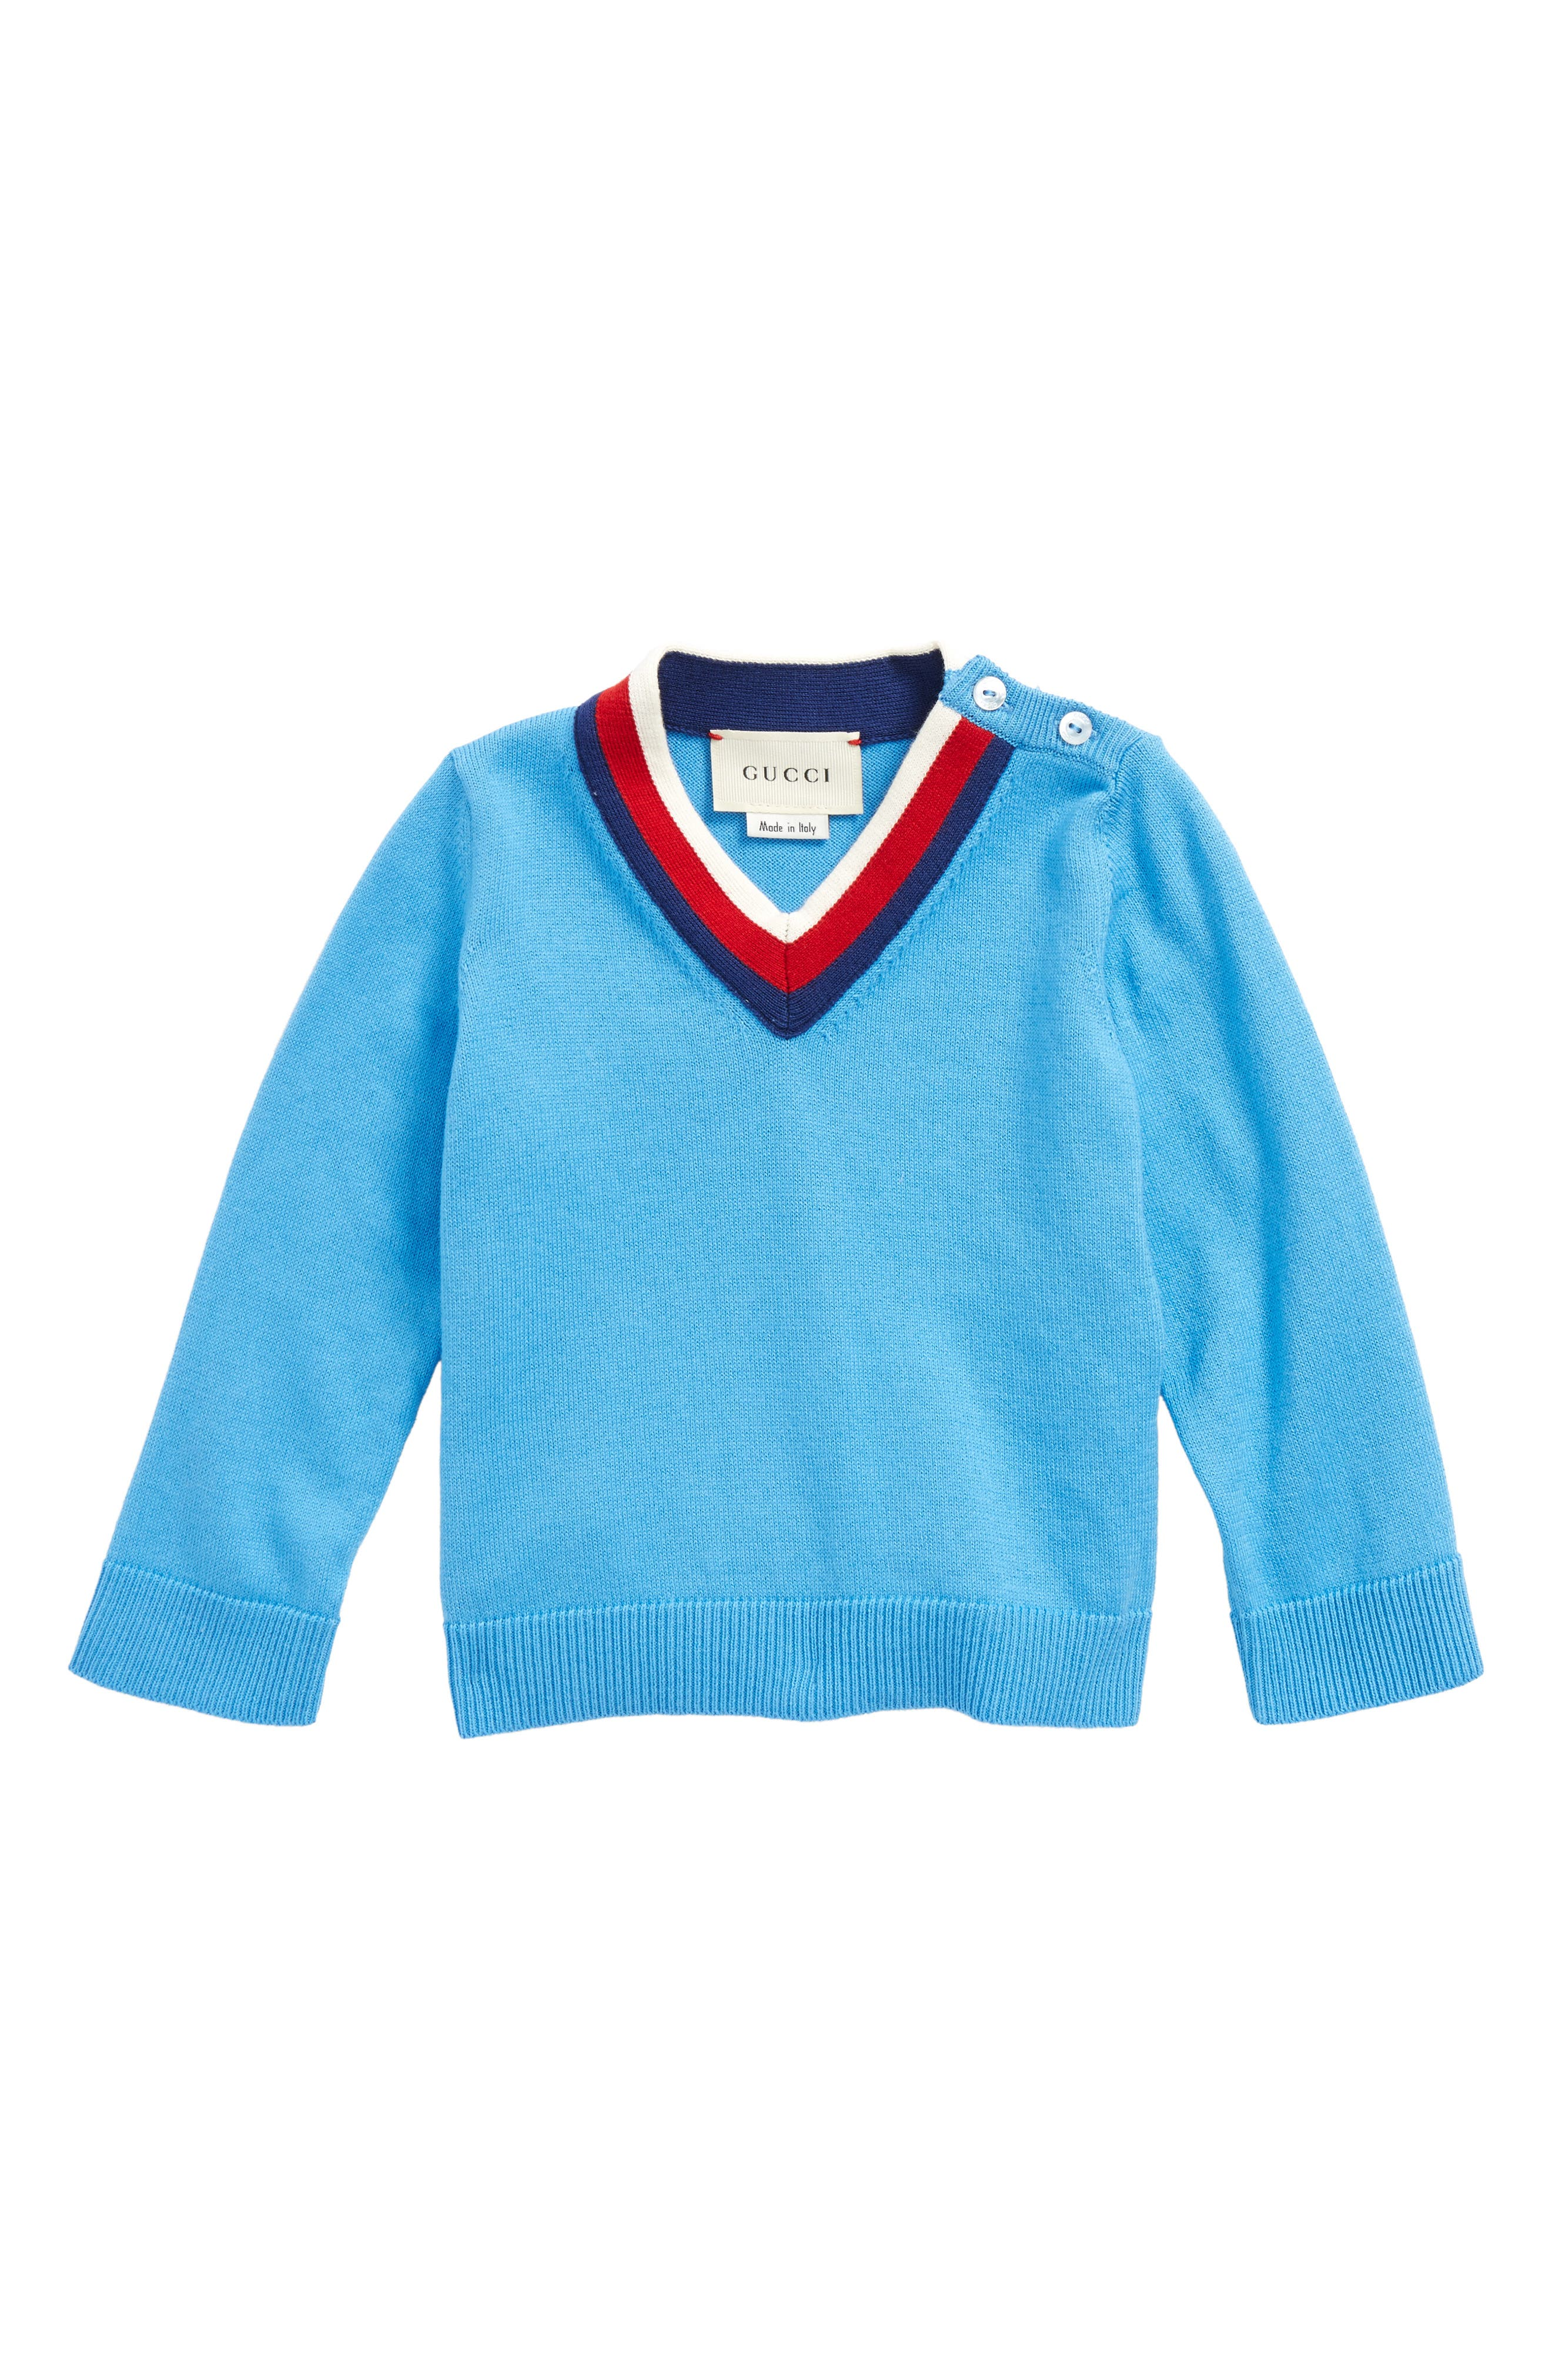 V-Neck Sweater,                             Main thumbnail 1, color,                             Royal/ Ivory